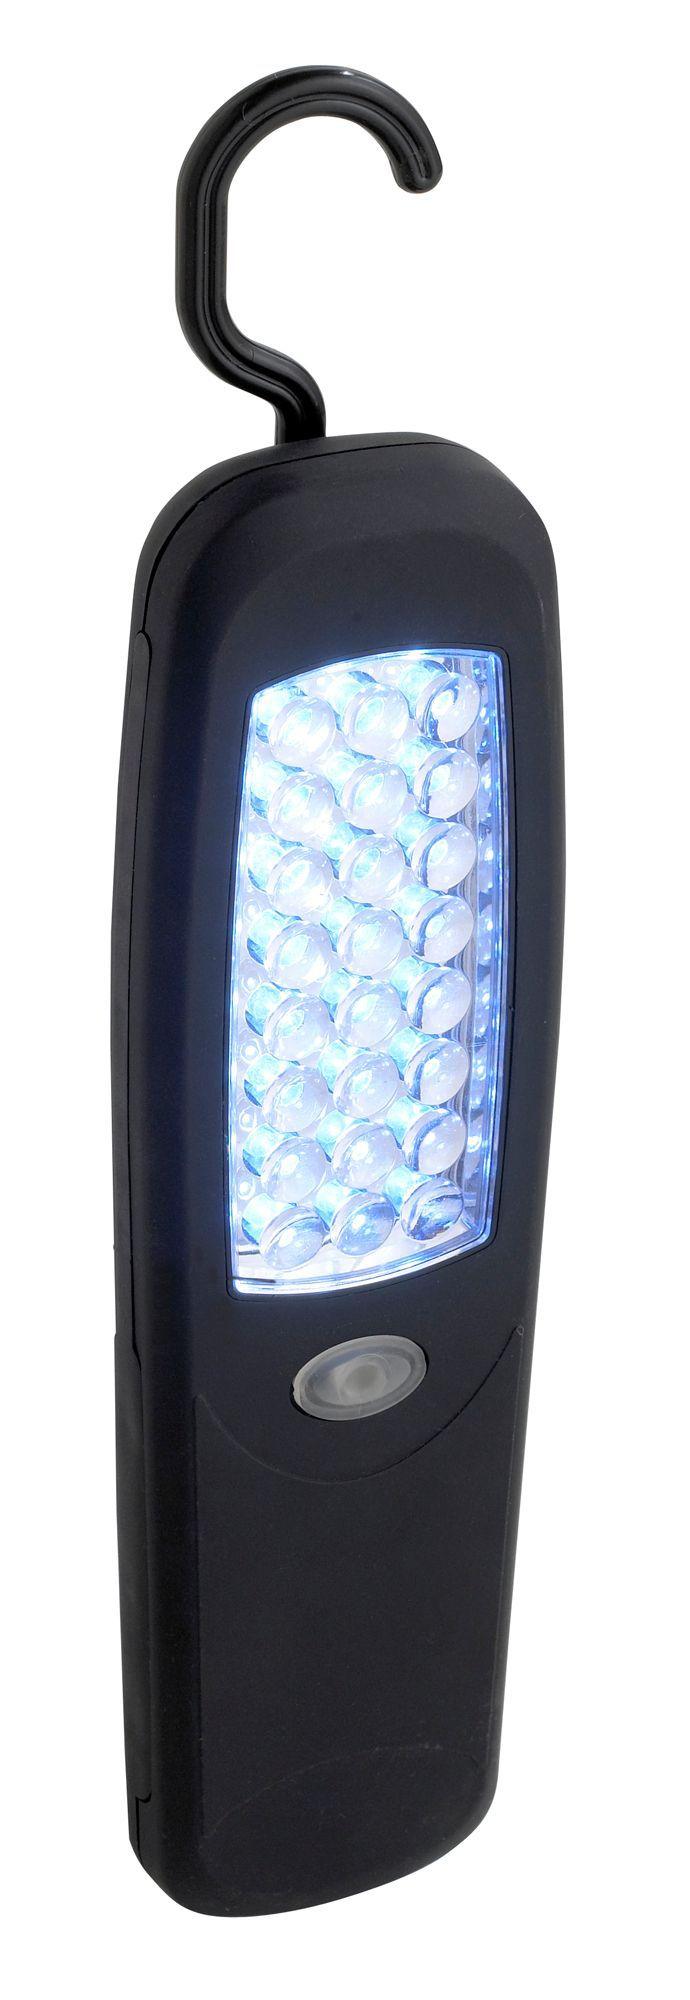 B&Q 72lm Plastic LED Black Inspection Light